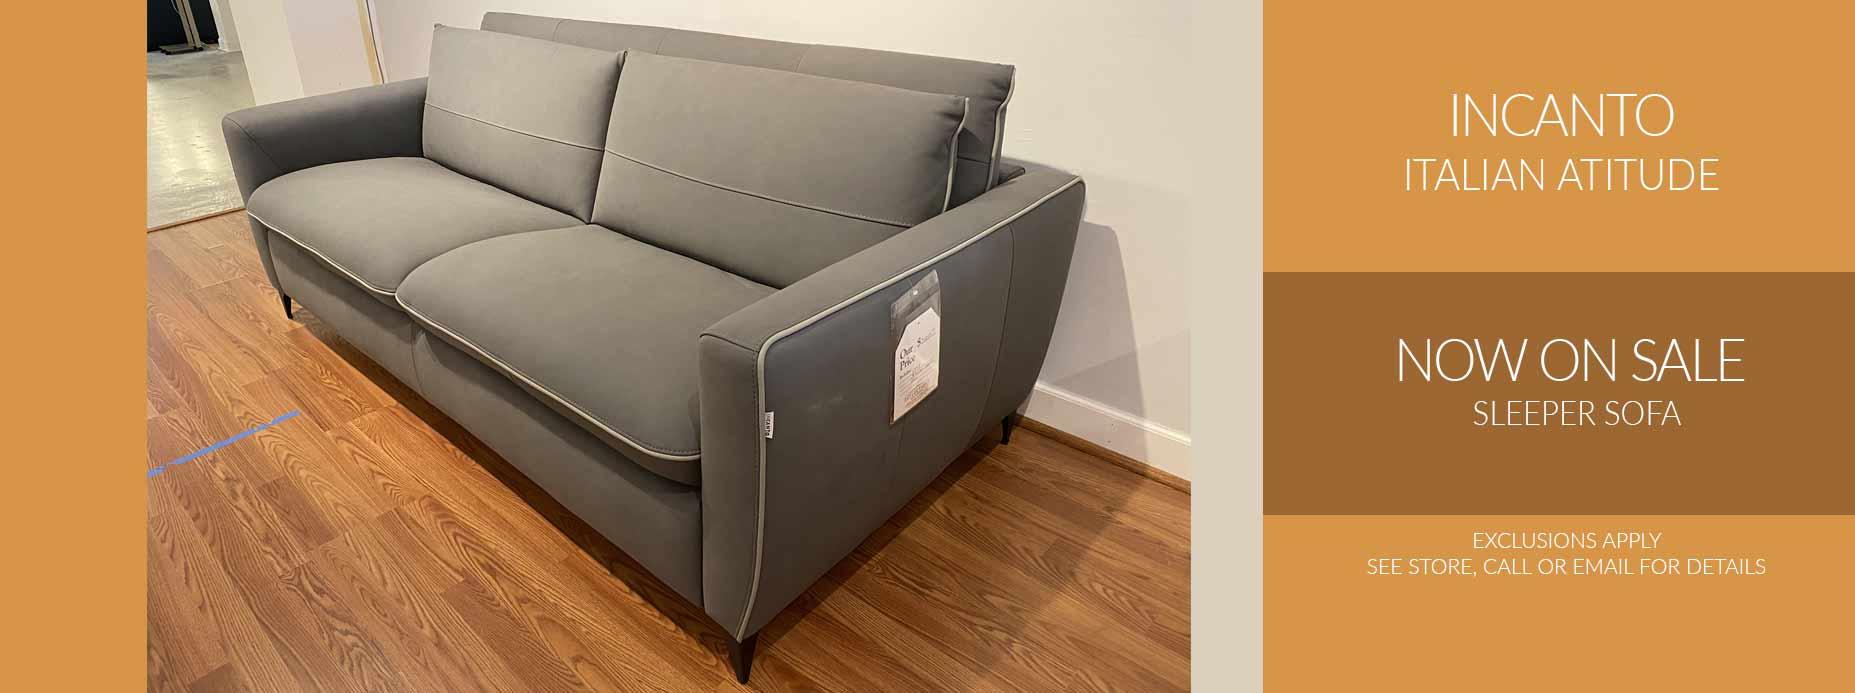 Incanto Sleeper Sofa Sale